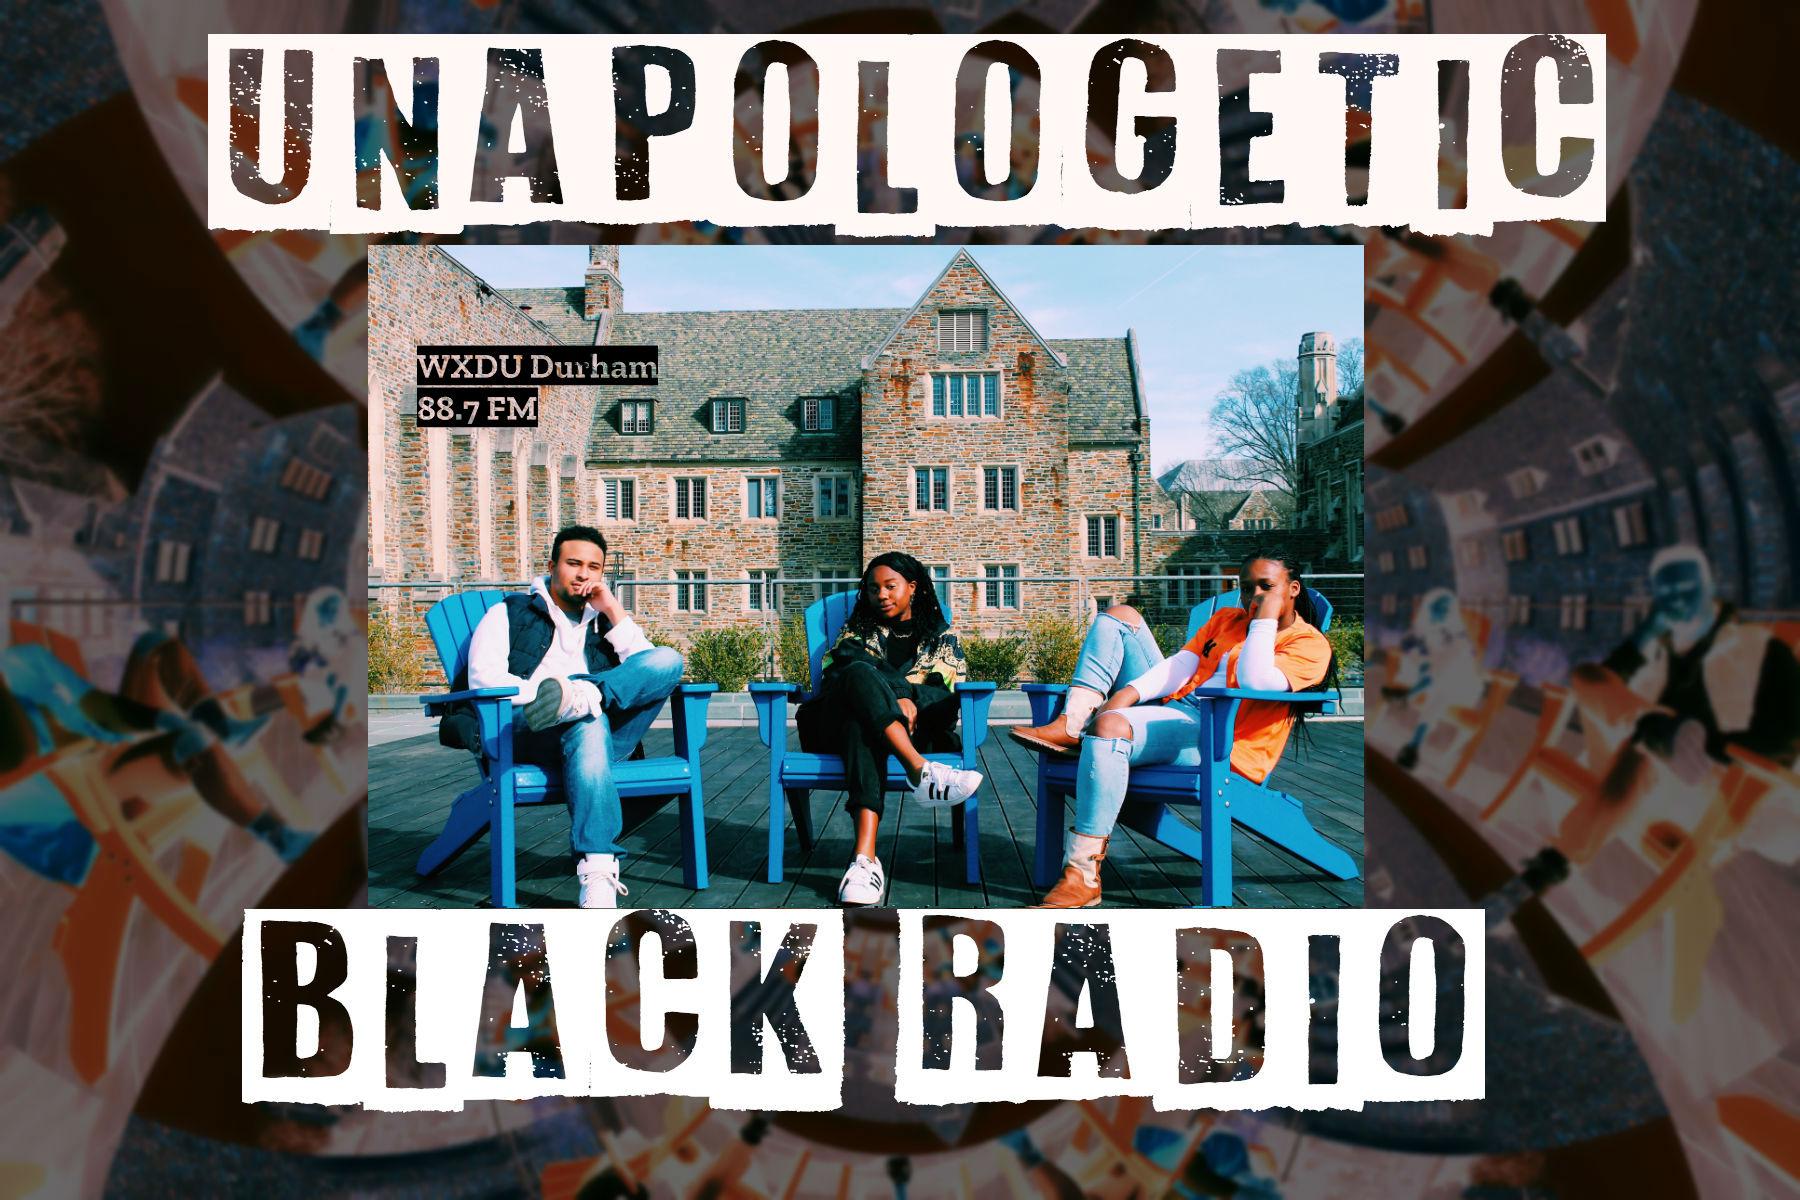 Unapologetic Black Radio